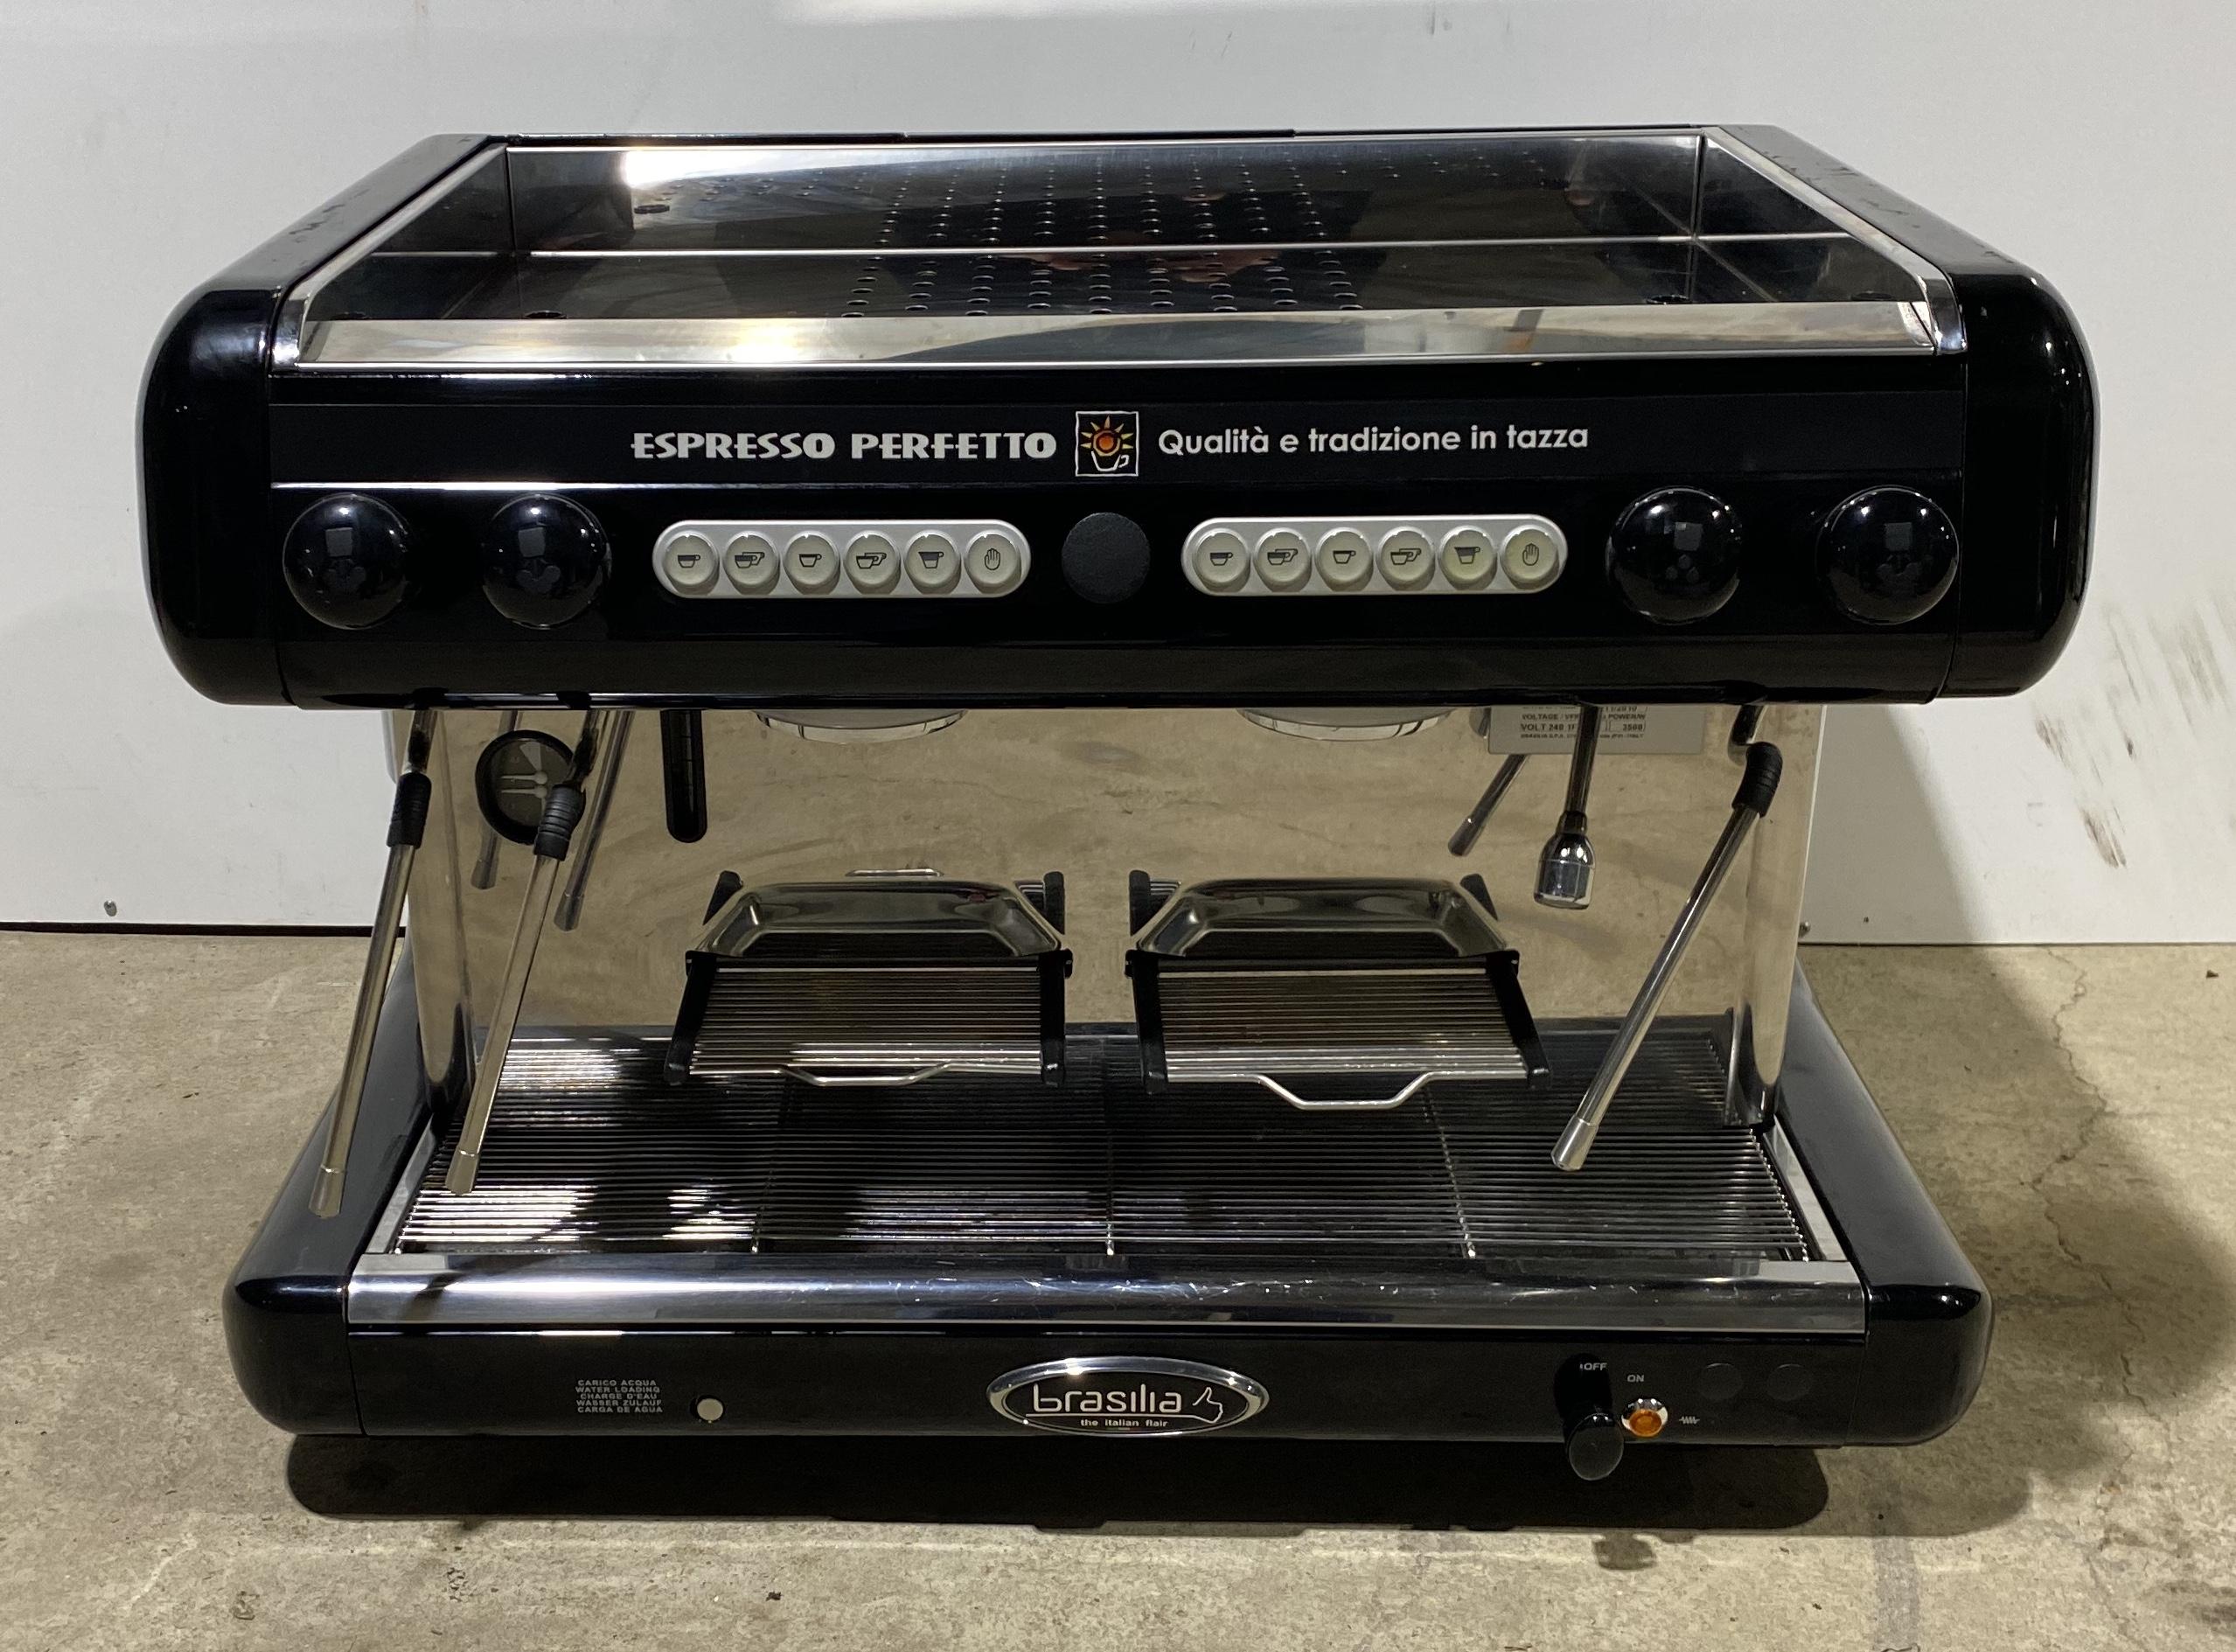 BRASILIA Espresso Perfetto 2 Group Coffee Machine